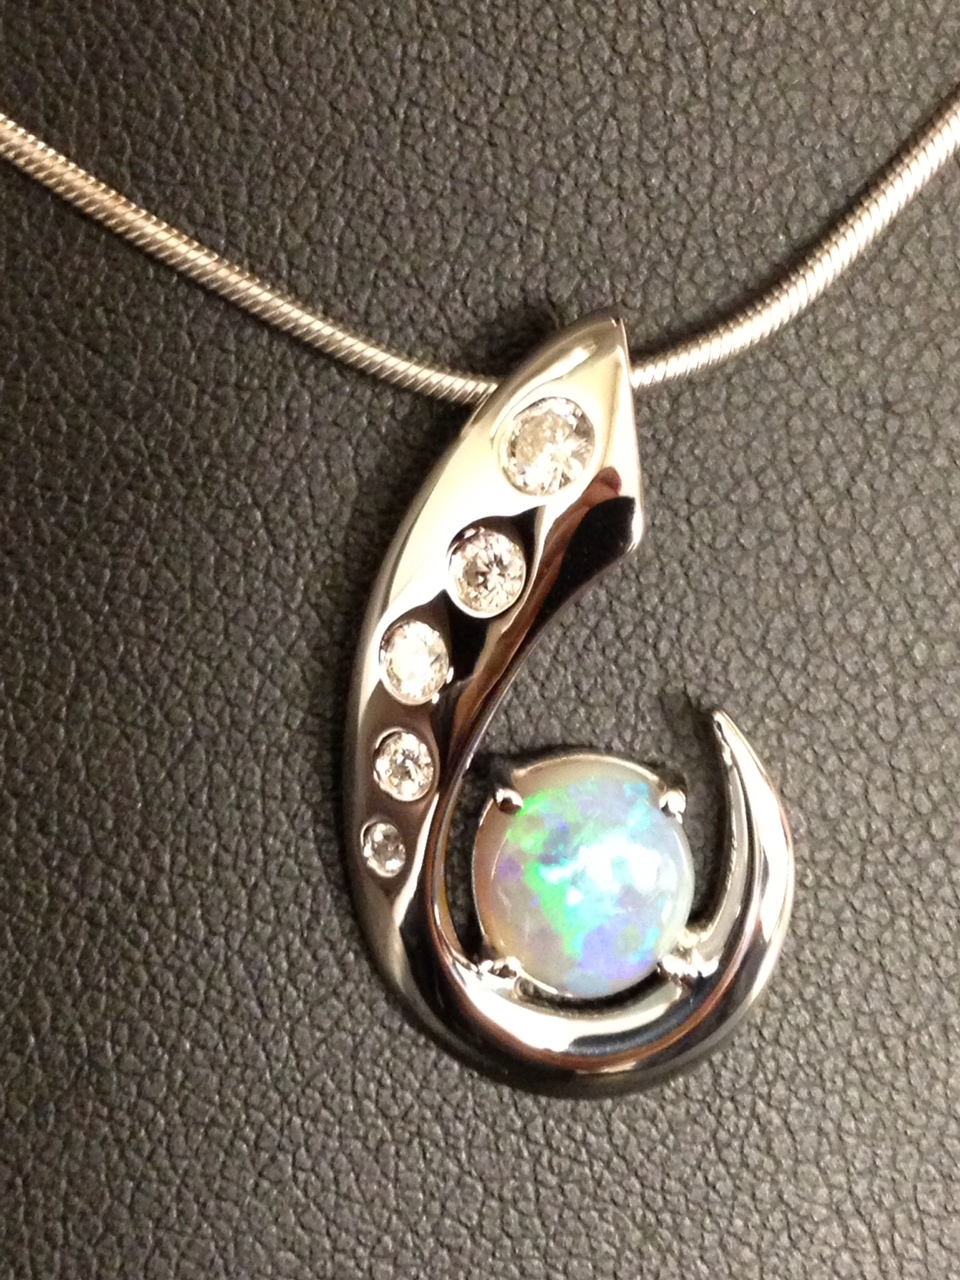 unique-custom-opal-pendant-gold-diamond-accents-pendant-craft-revival-jewelry-store